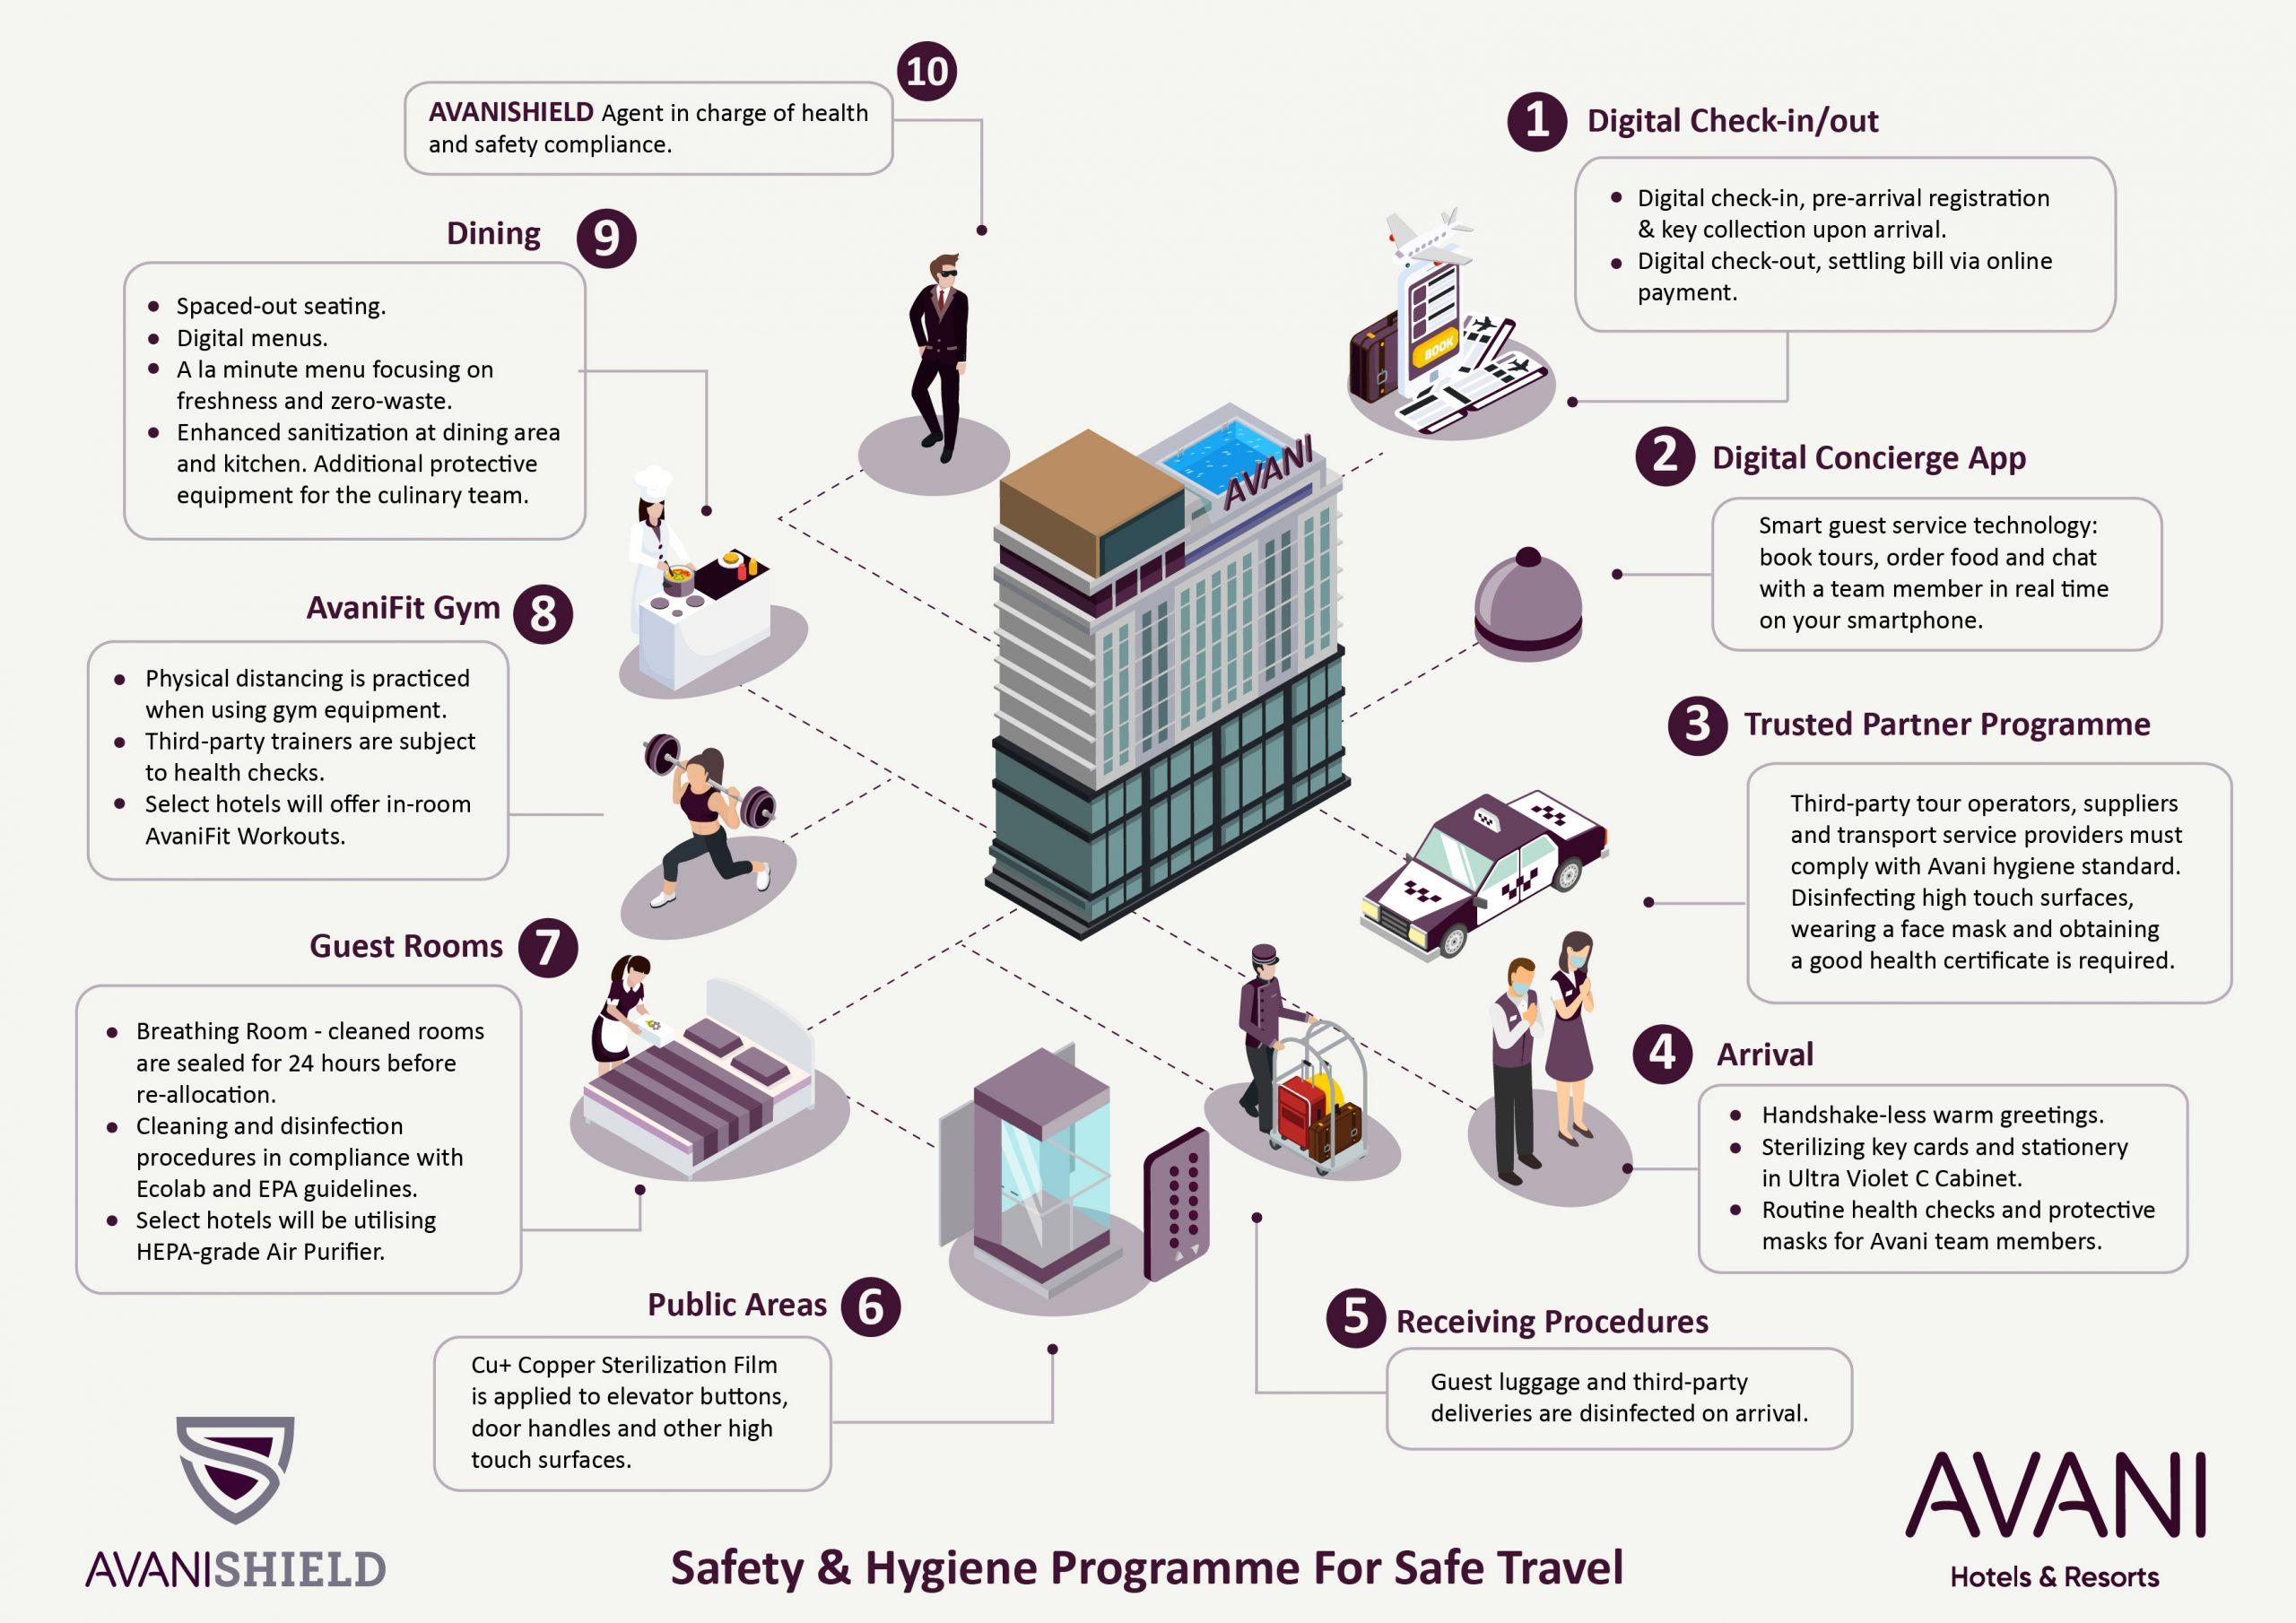 AvaniSHIELD Safety & Hygiene Programme for Safe Travel